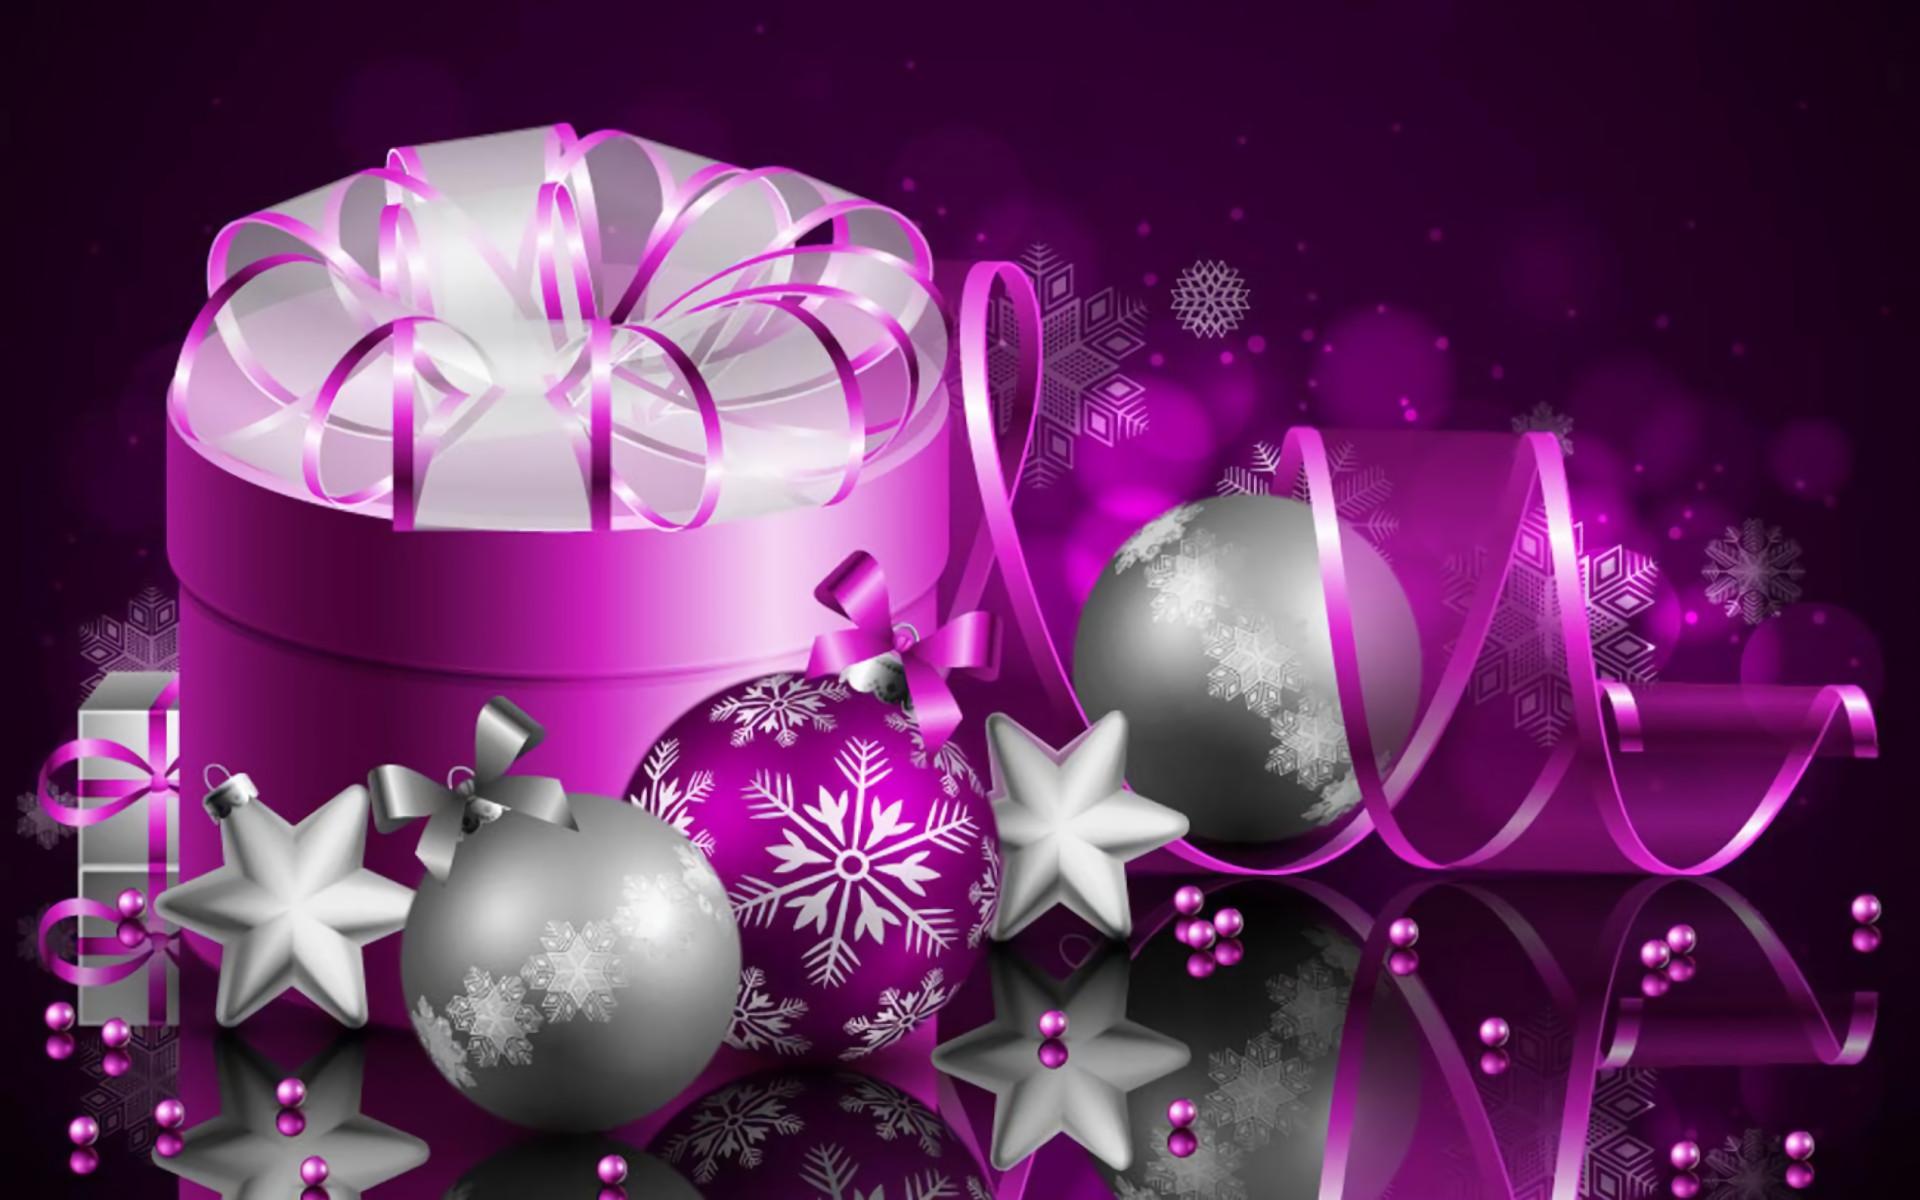 Holiday – Christmas Holiday Purple Silver Gift Christmas Ornaments Ribbon  Wallpaper